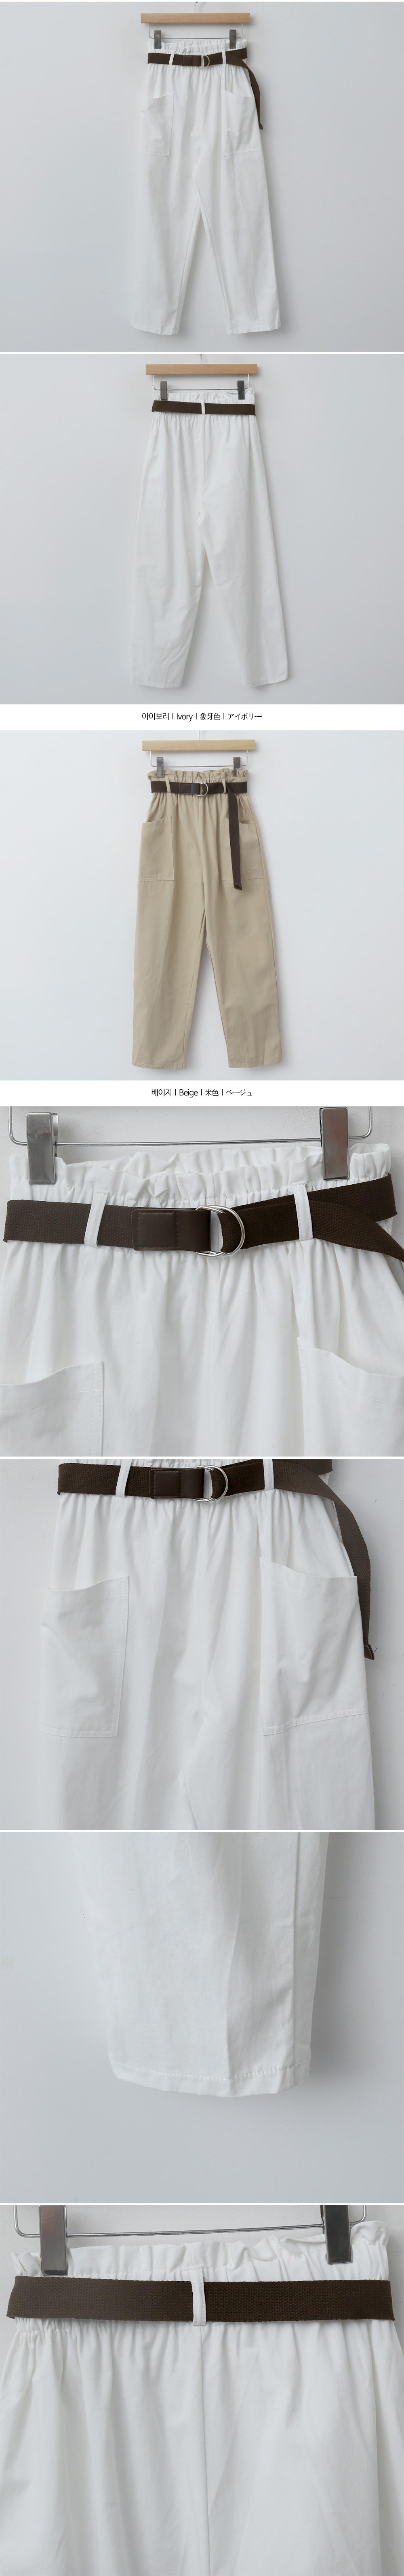 Belt Boy Band Pants